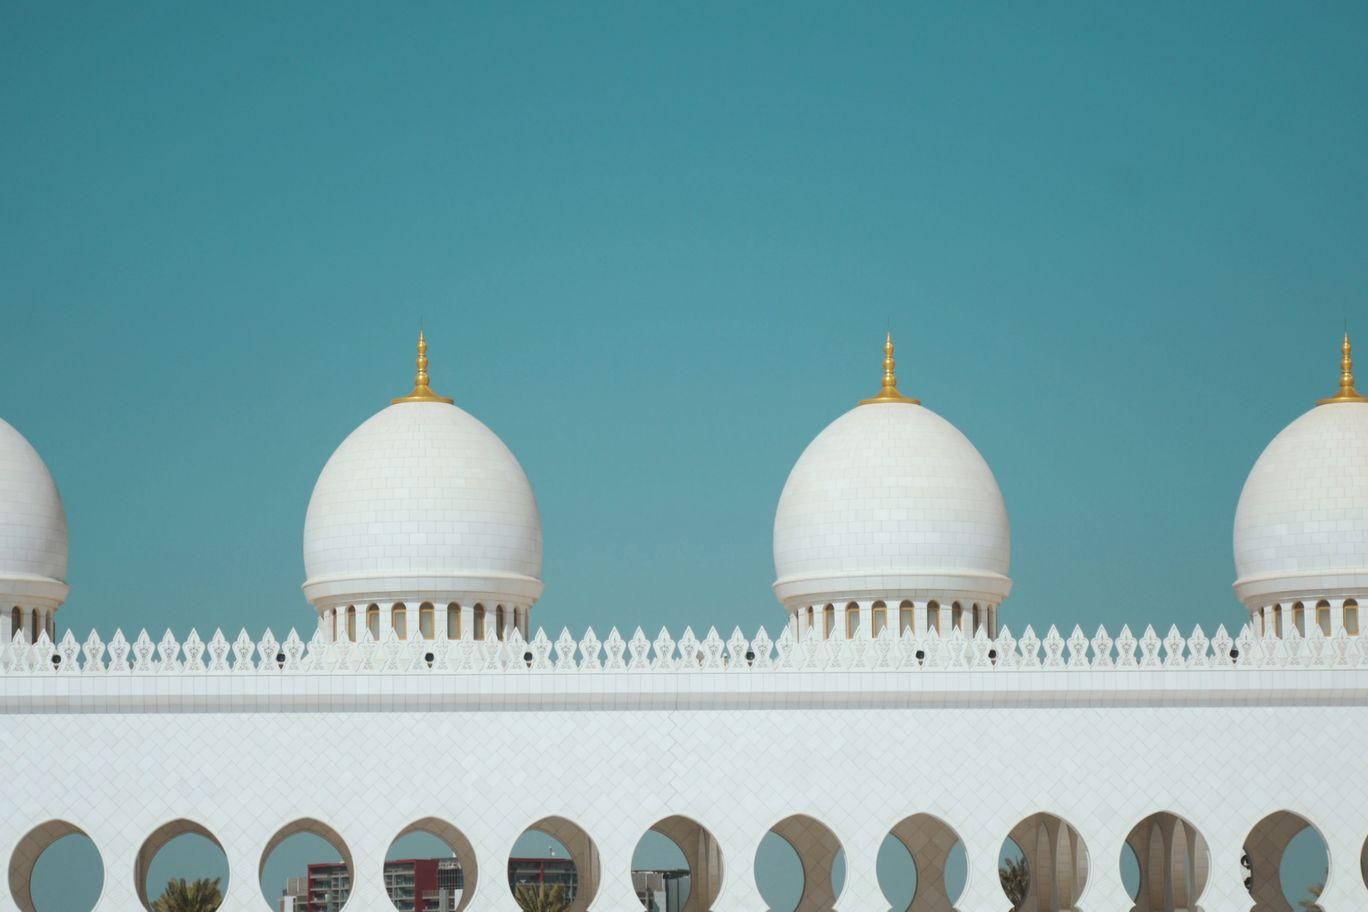 Photo of Dubai - United Arab Emirates By Shubeedobee